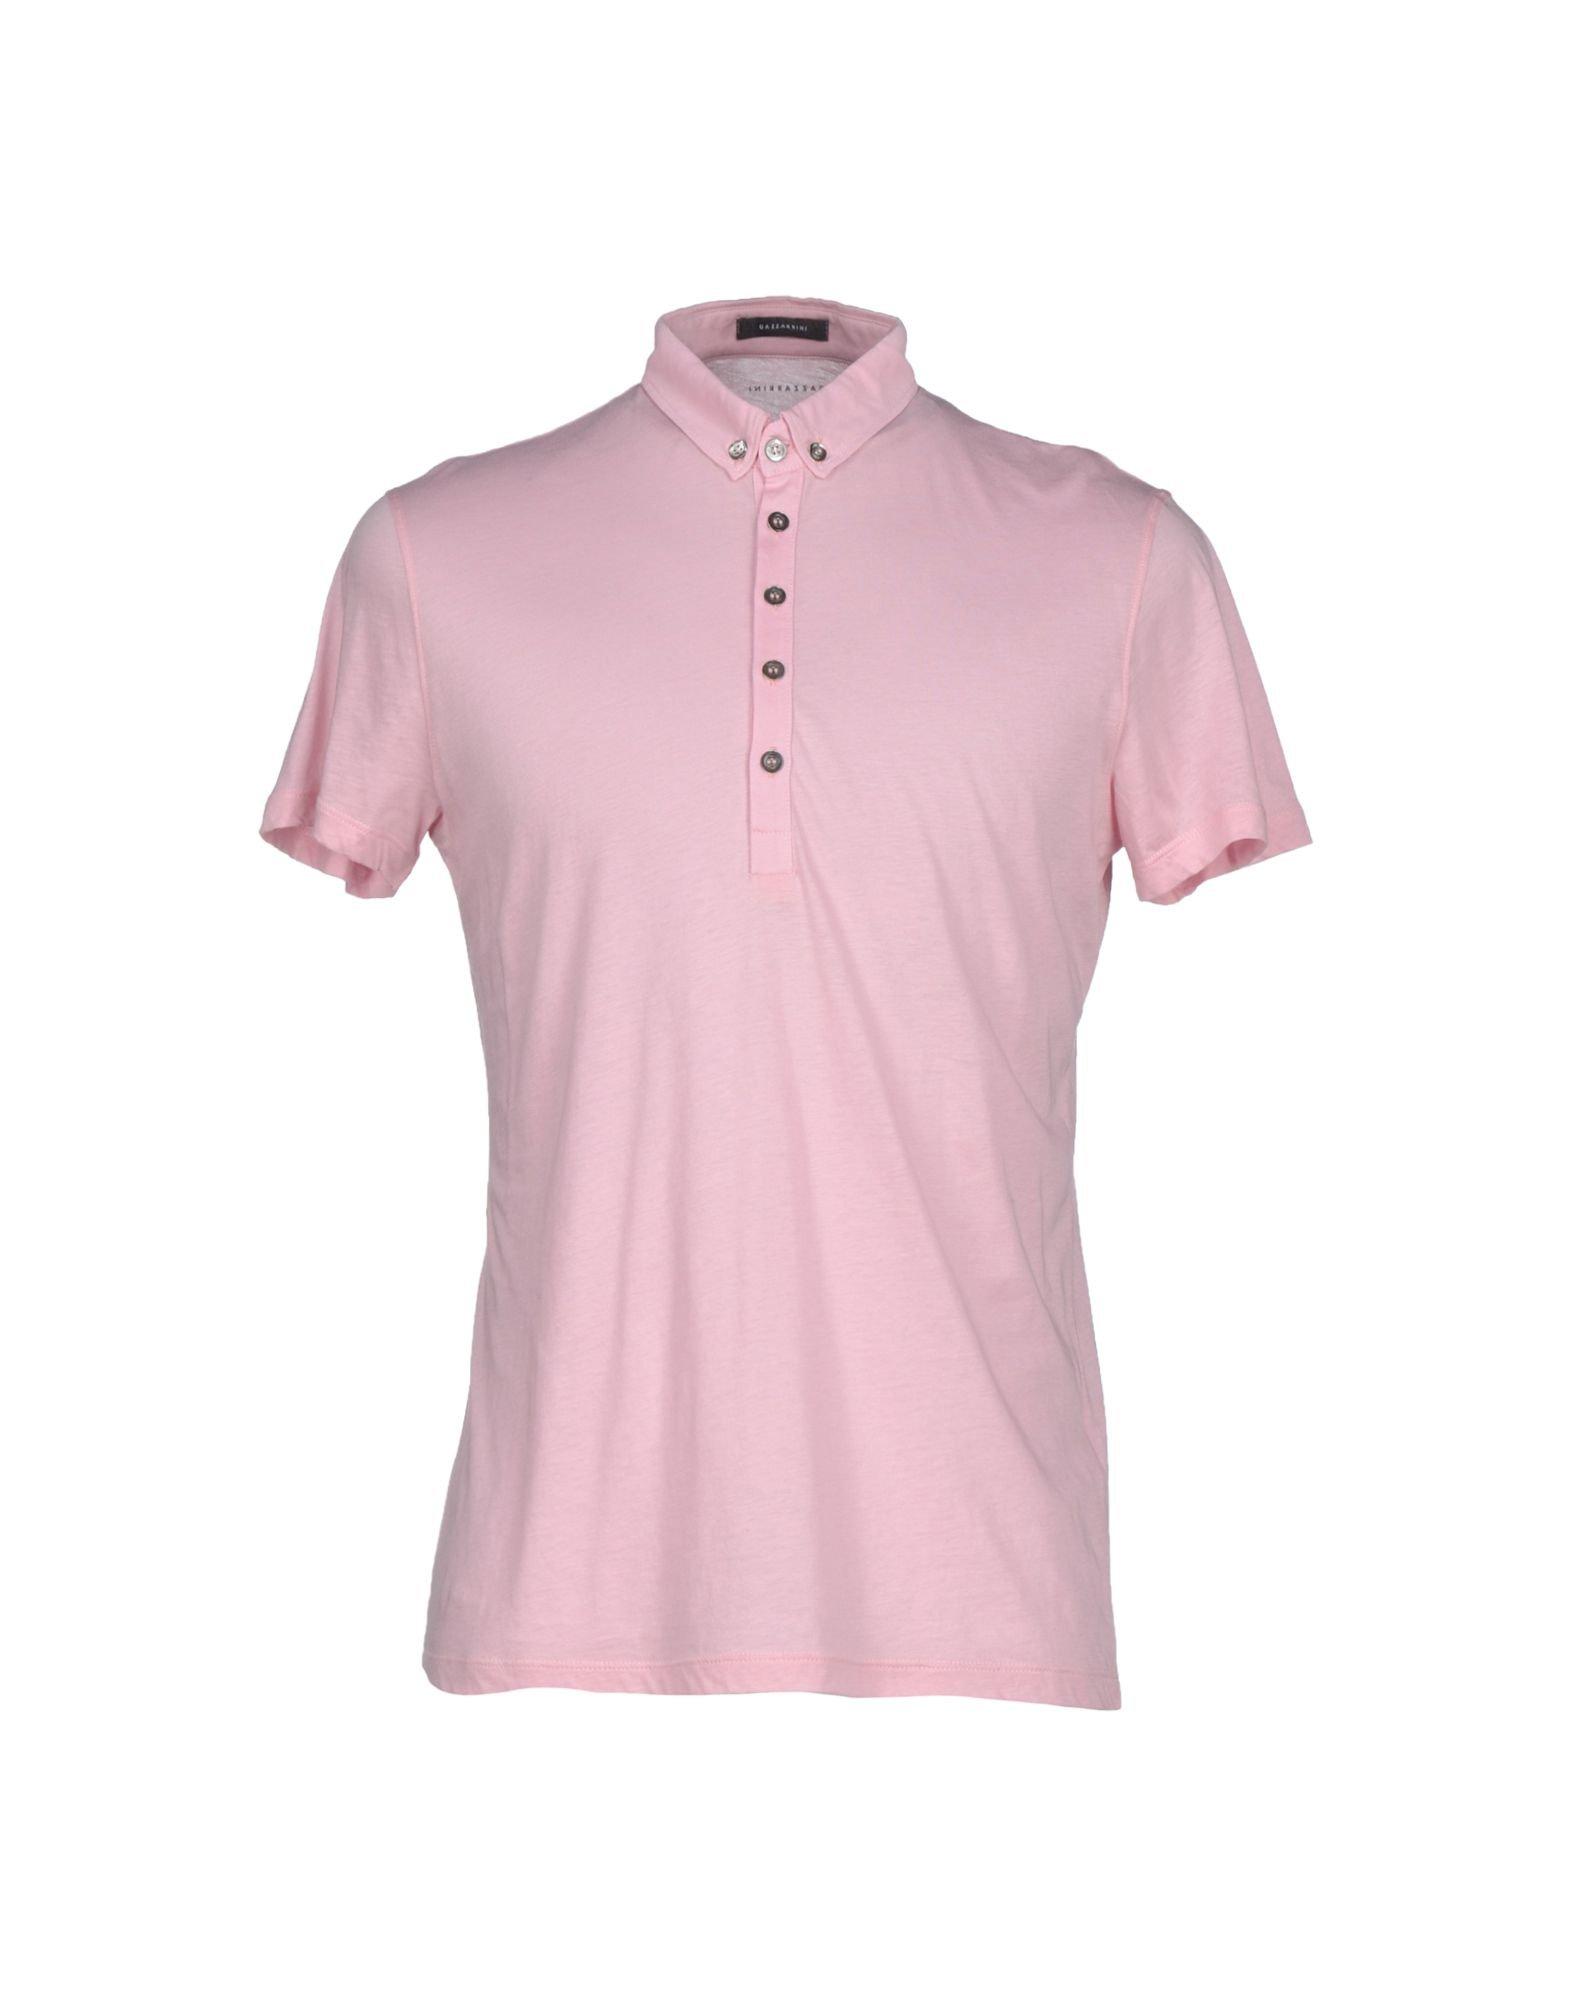 Gazzarrini Pink Polo Shirt For Men Lyst